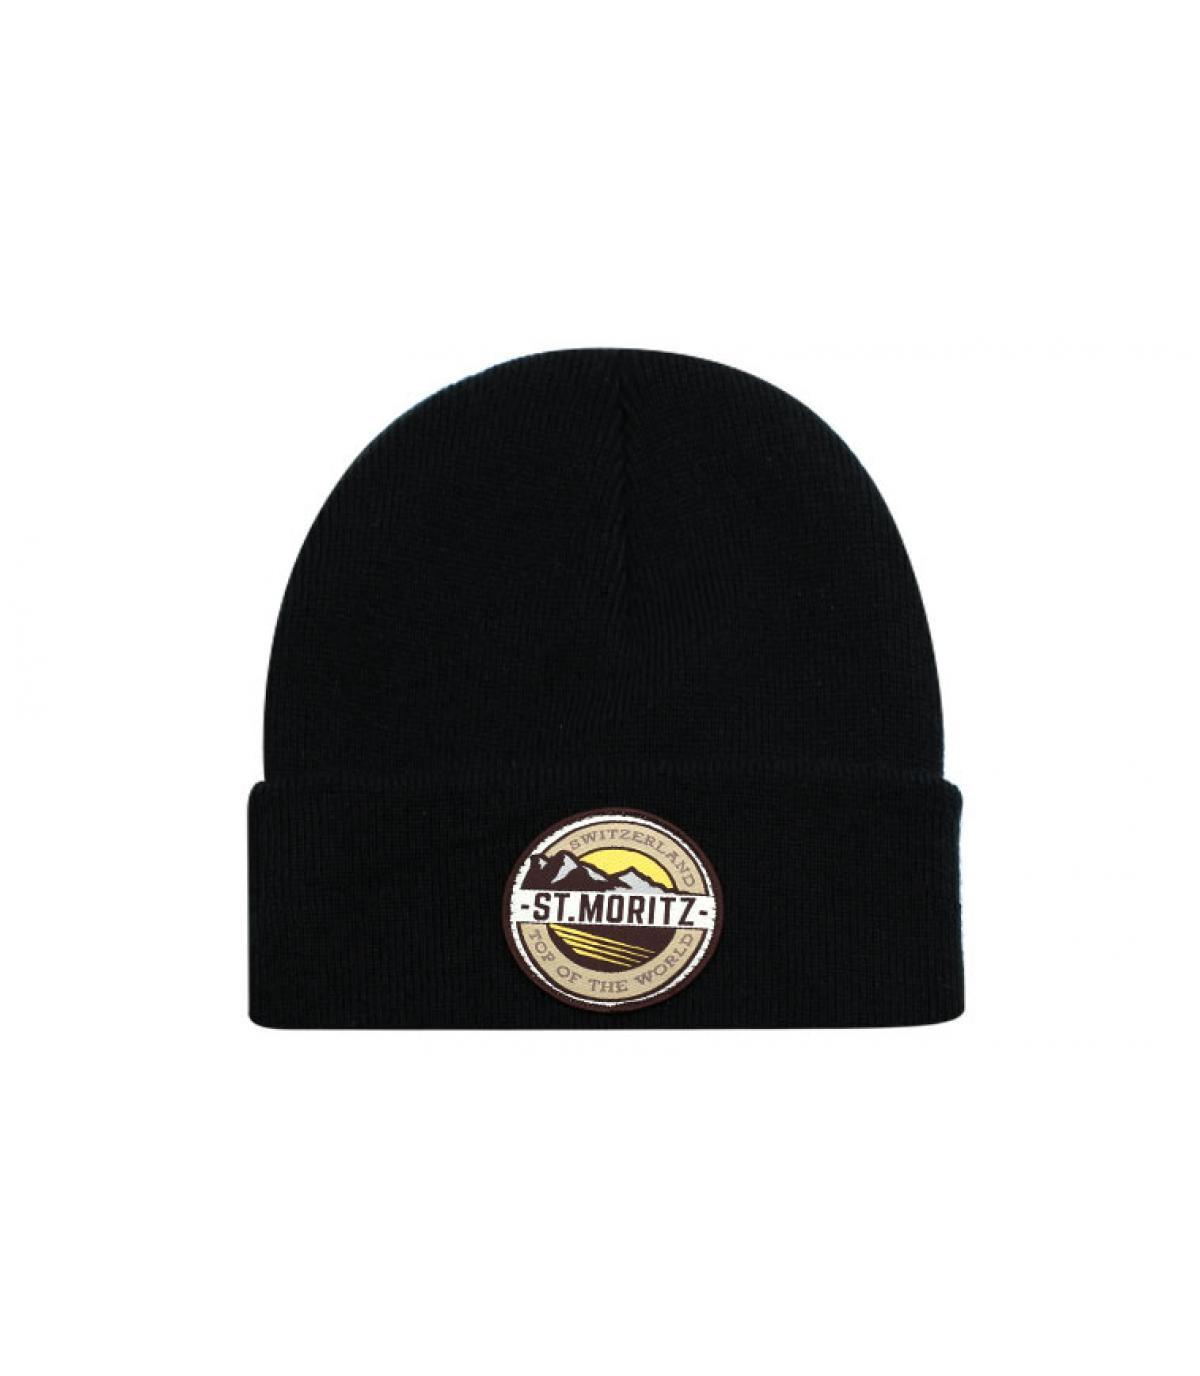 bonnet st moritz noir